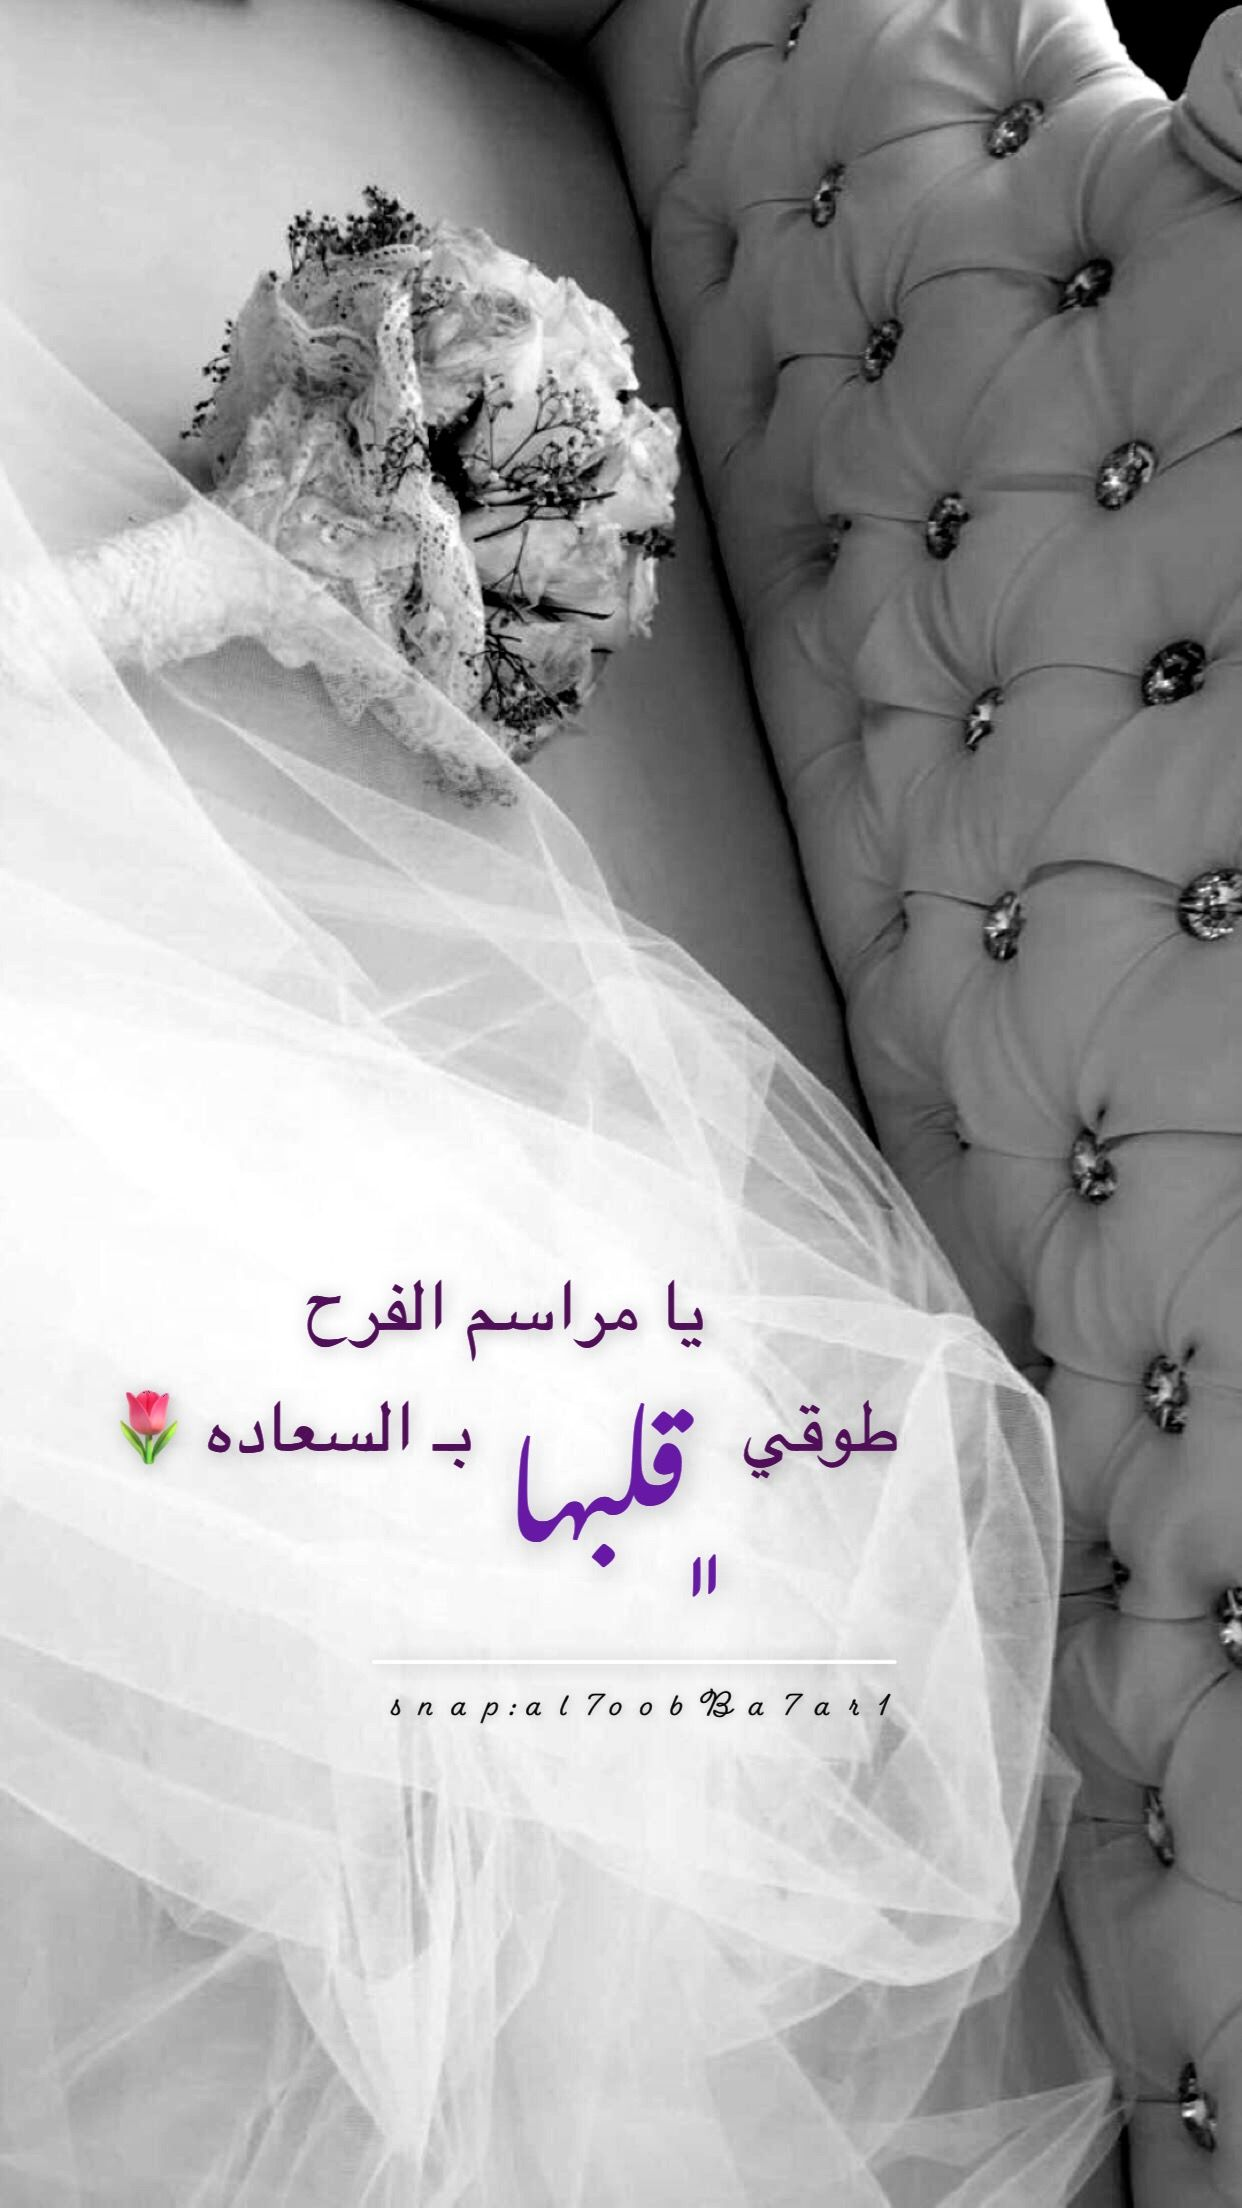 همسة يا مراسم الفرح طوقي قلبها بـ السعاده تصويري تصويري سناب تصميمي تصميم طرحه Love Quotes For Wedding Wedding Cards Images Bride Pictures